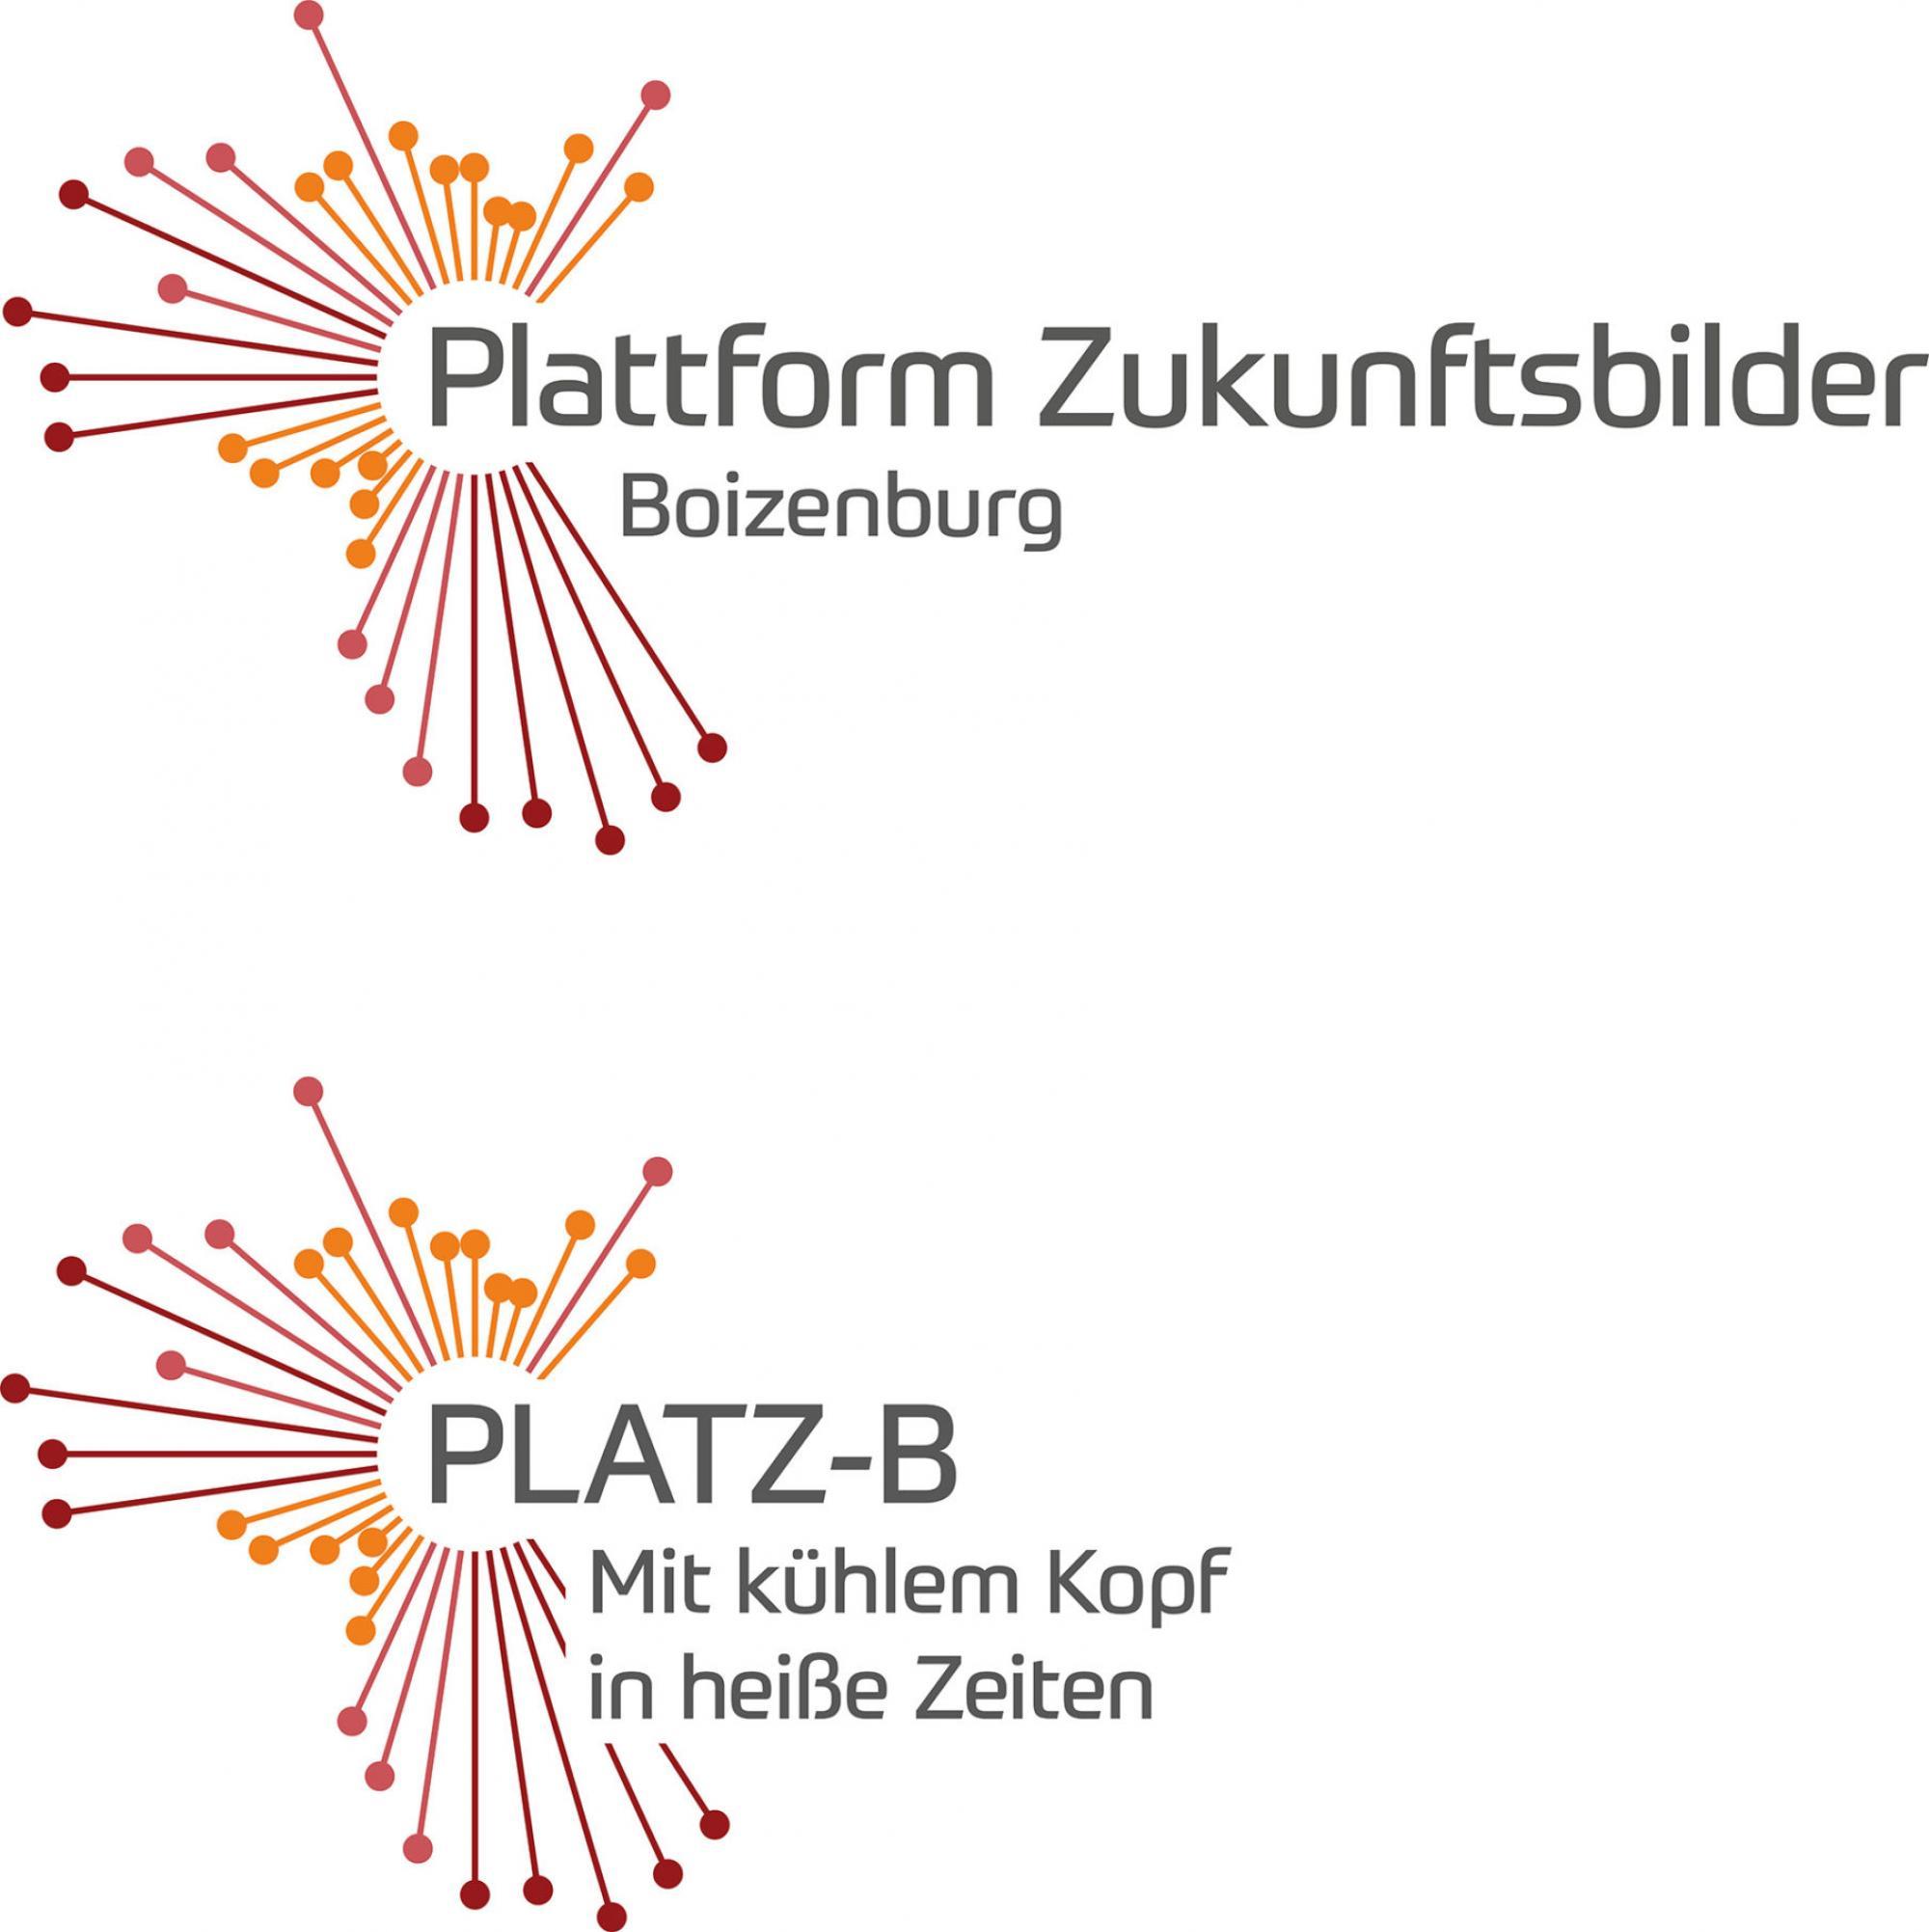 Boizenburg-Logos-corporate-design-formlos-berlin-klima-1808x1811-2